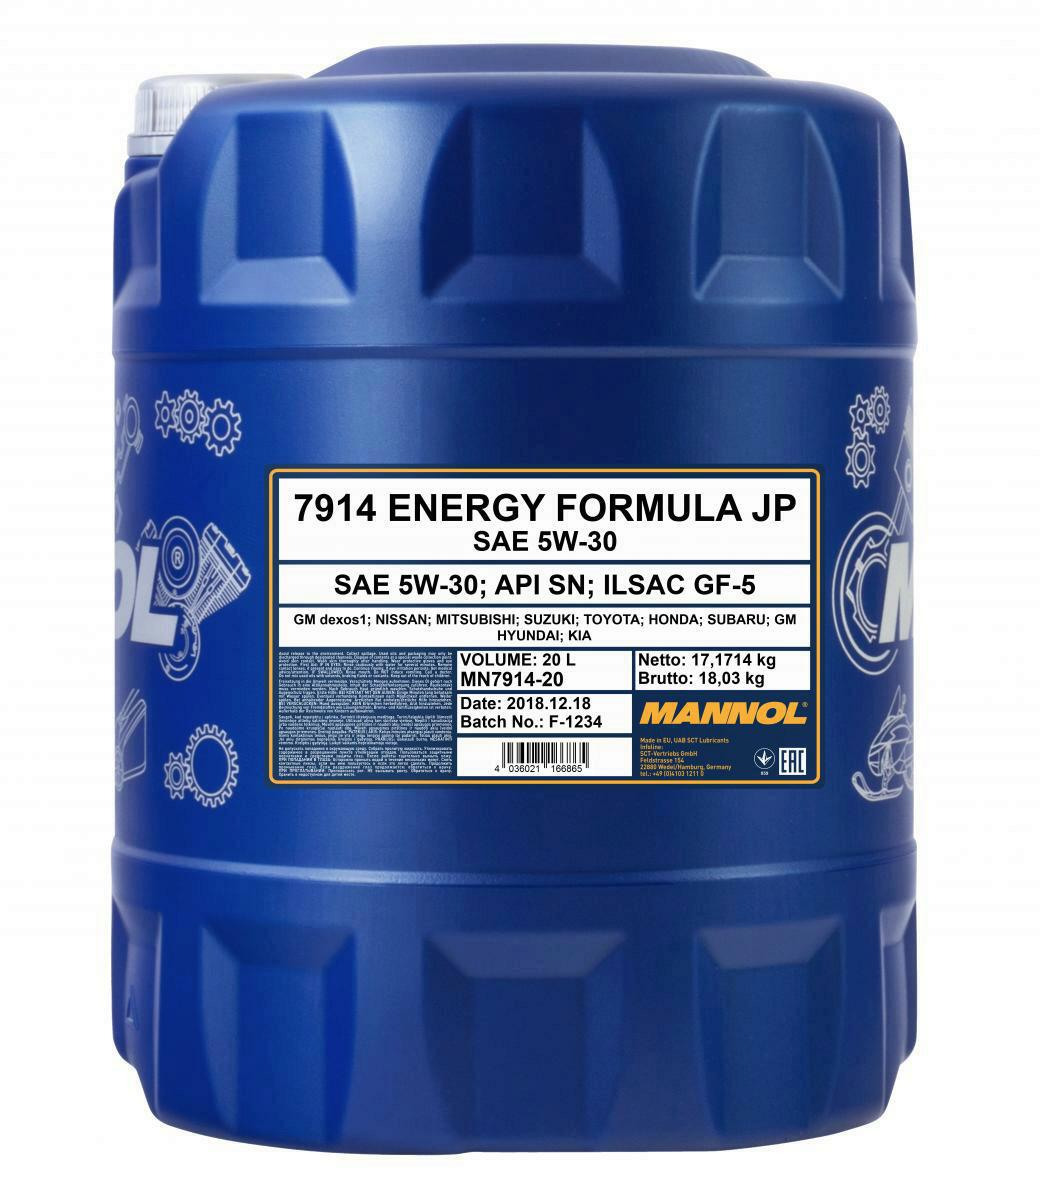 Mannol Energy Formular JP 20 Liter